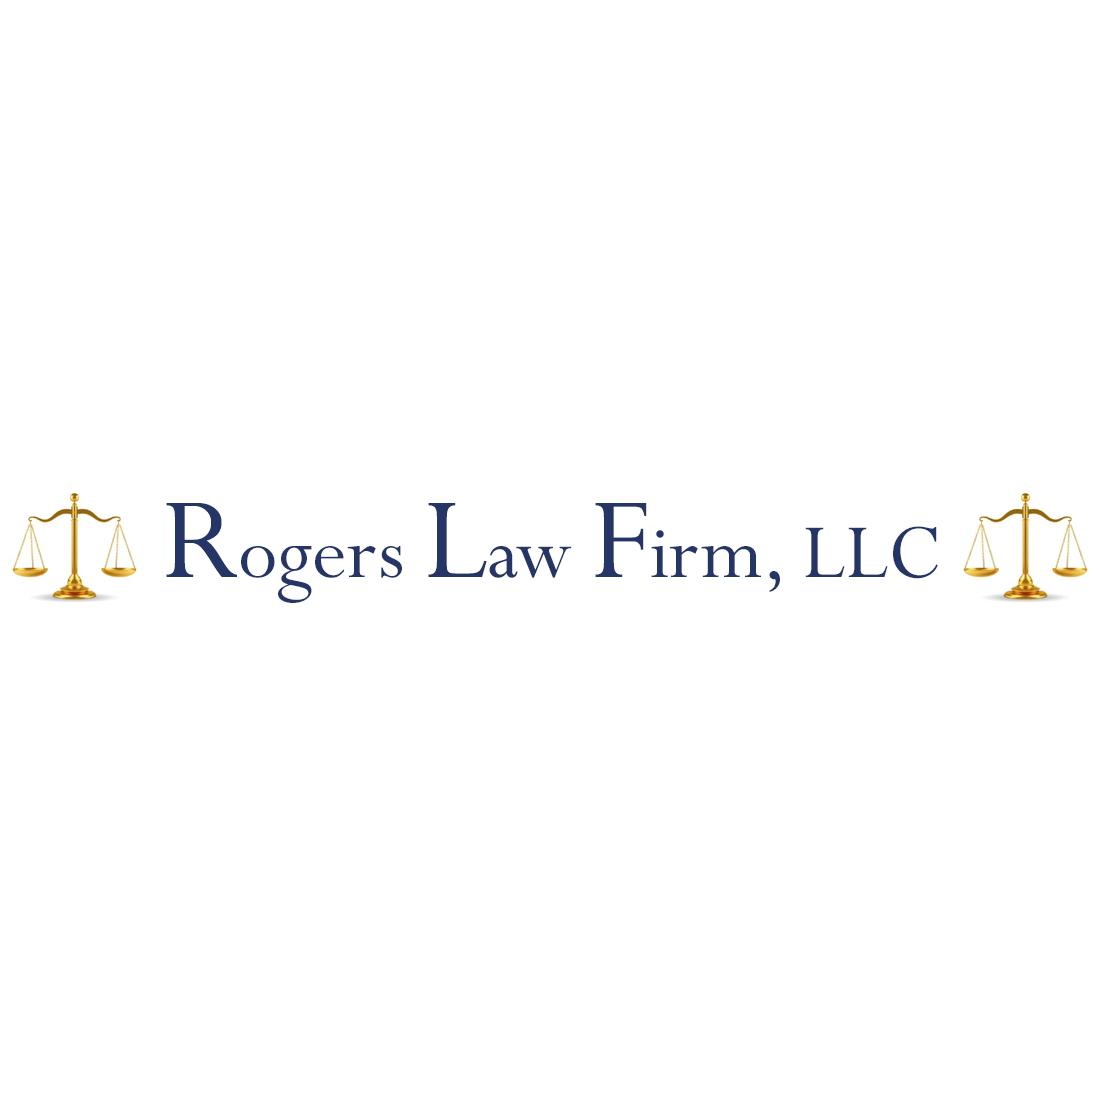 Rogers Law Firm LLC